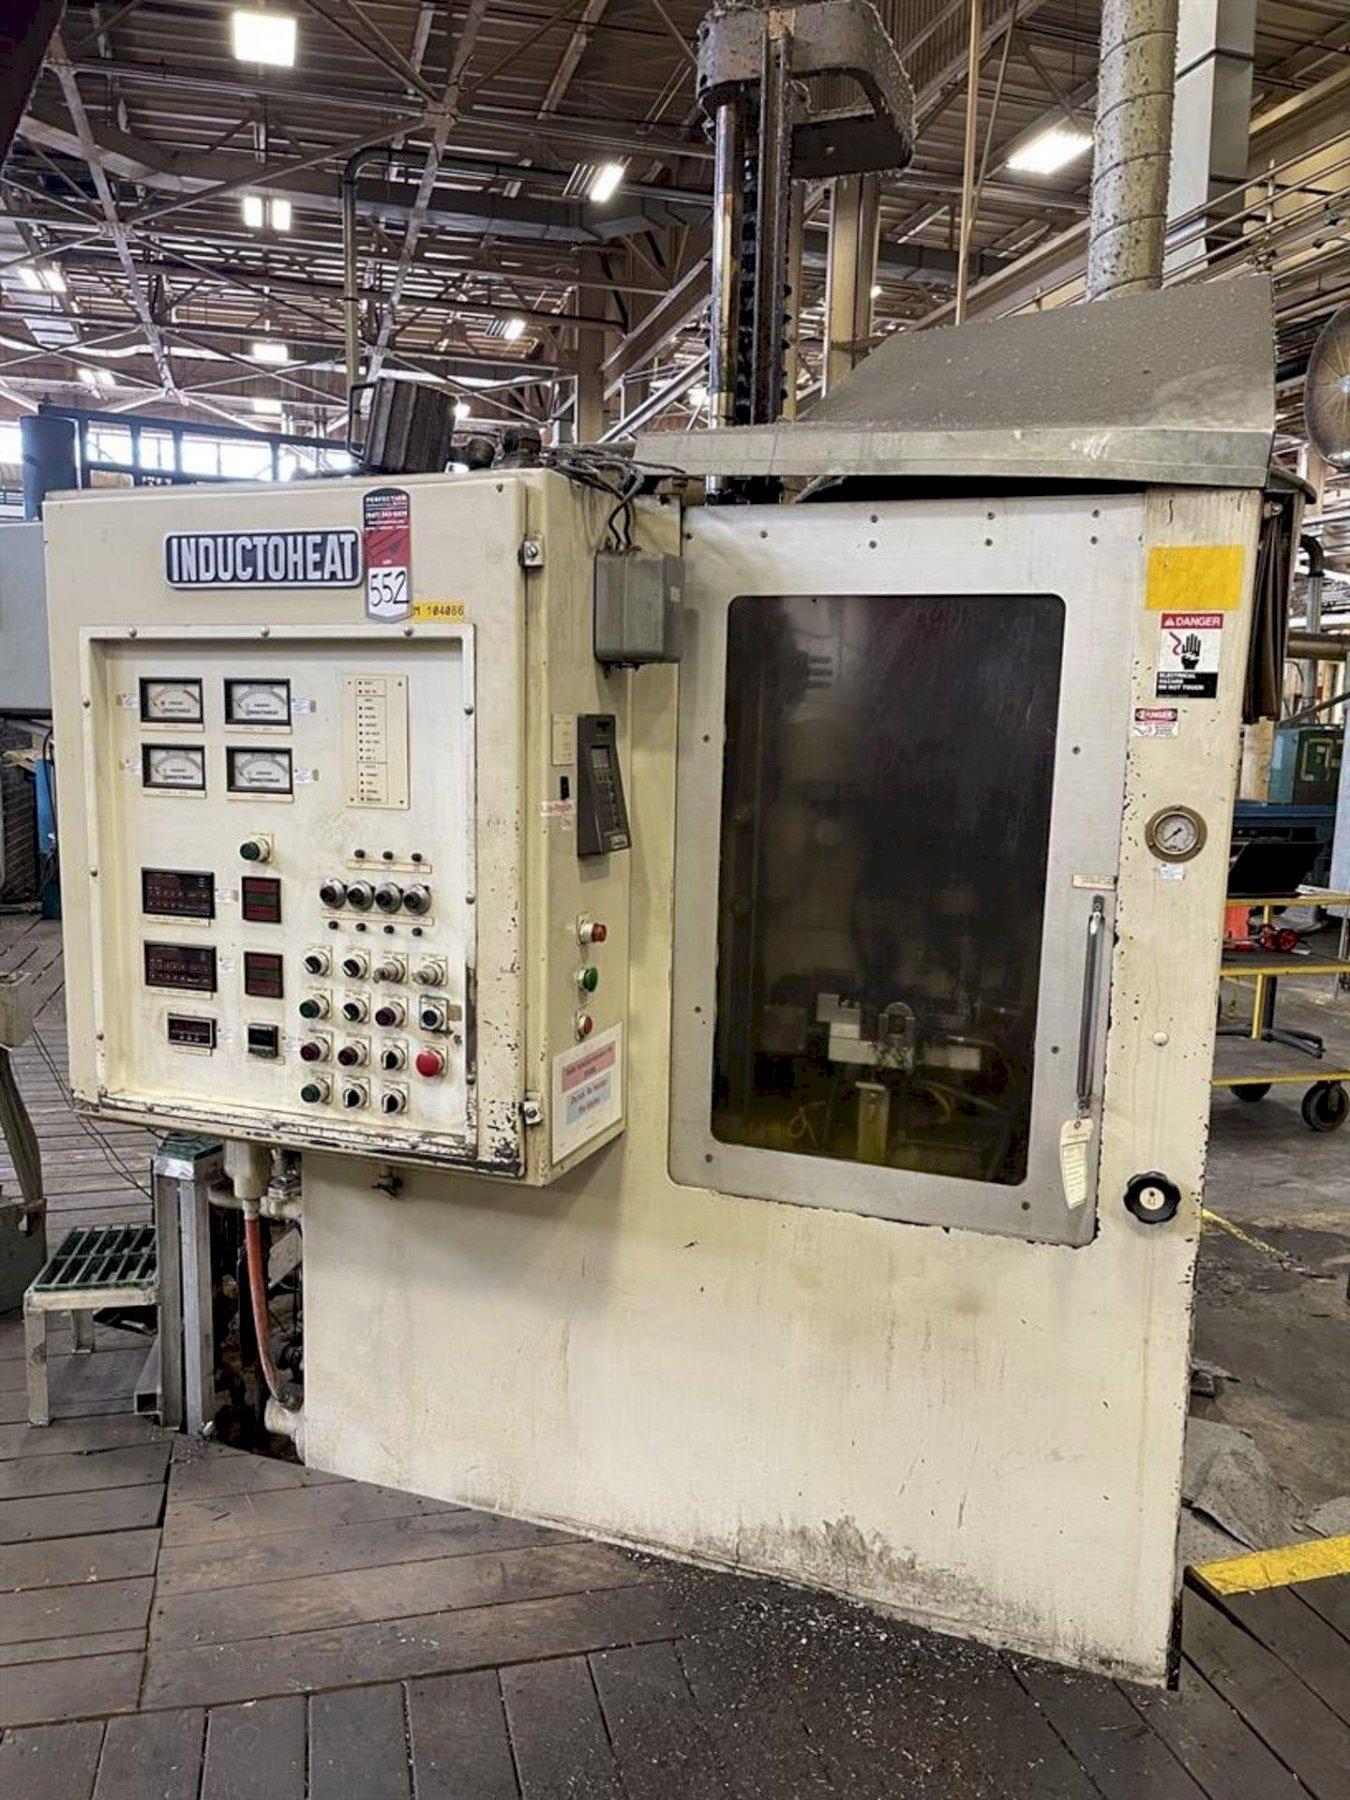 200 KW INDUCTOHEAT MODEL #USII-200-10 INDUCTION HEATER. STOCK # 0523021